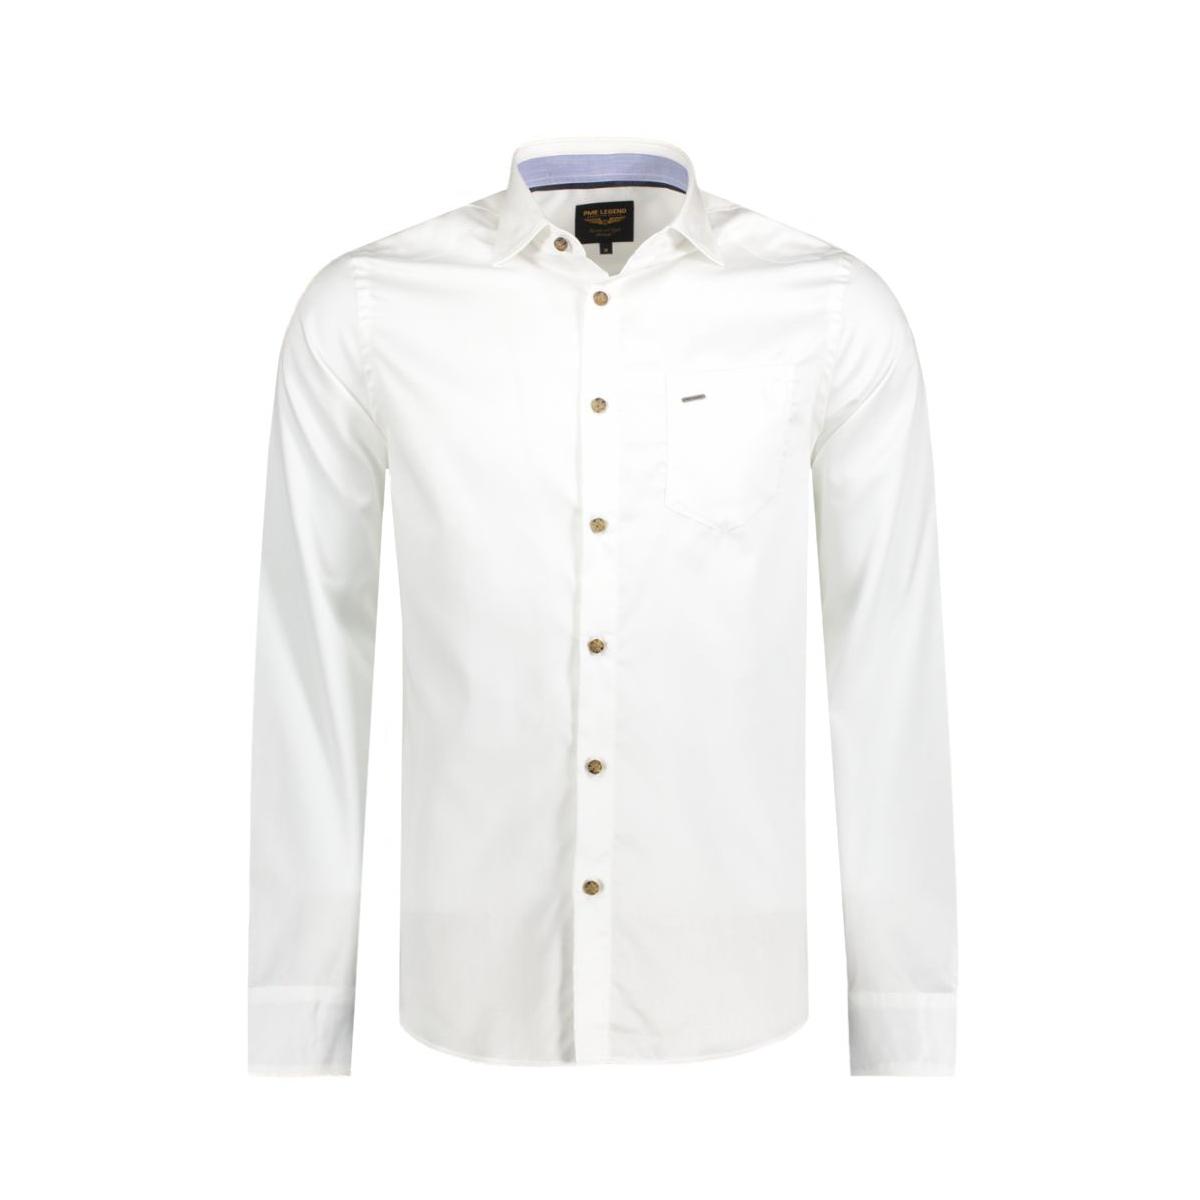 psi67290 pme legend overhemd 900